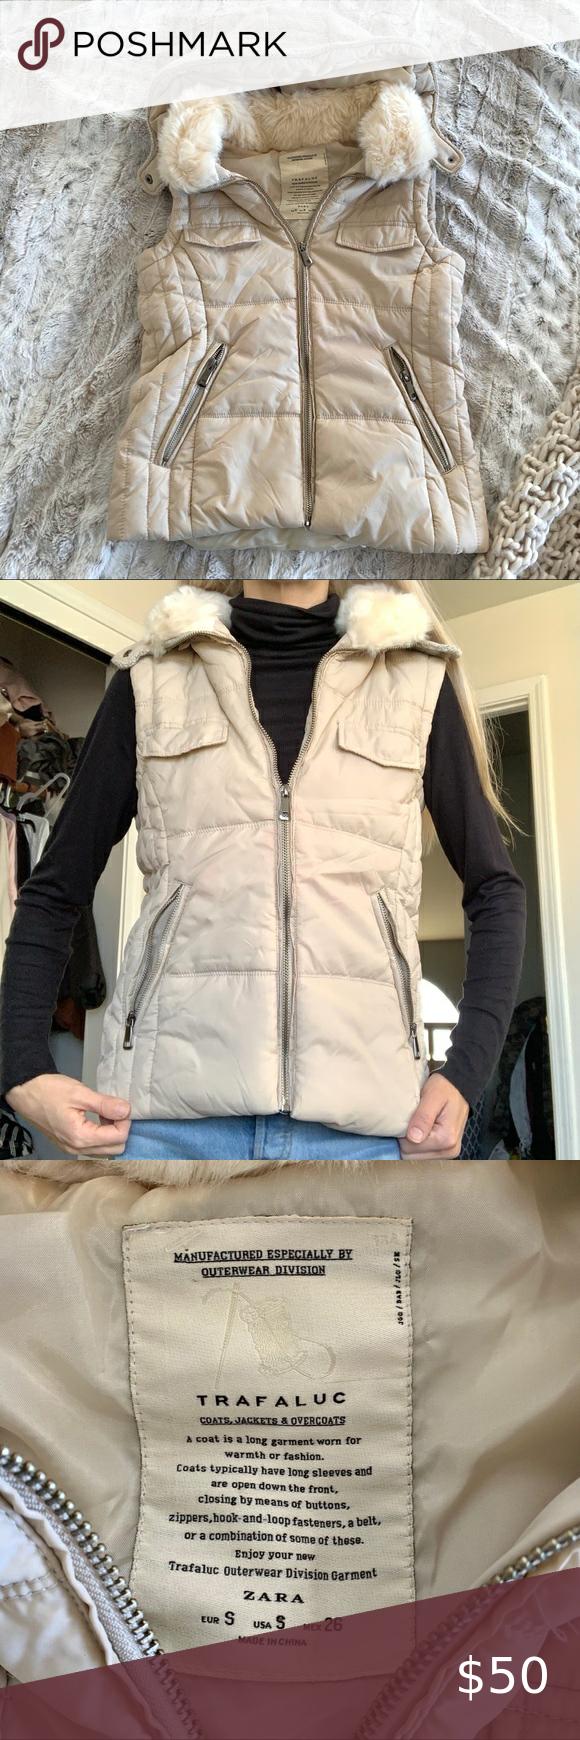 Zara Trafaluc Cream Fur Collar Knit Puffer Vest Sleeveless Puffer Faux Fur Vest Black Tan Knit Sweater [ 1740 x 580 Pixel ]